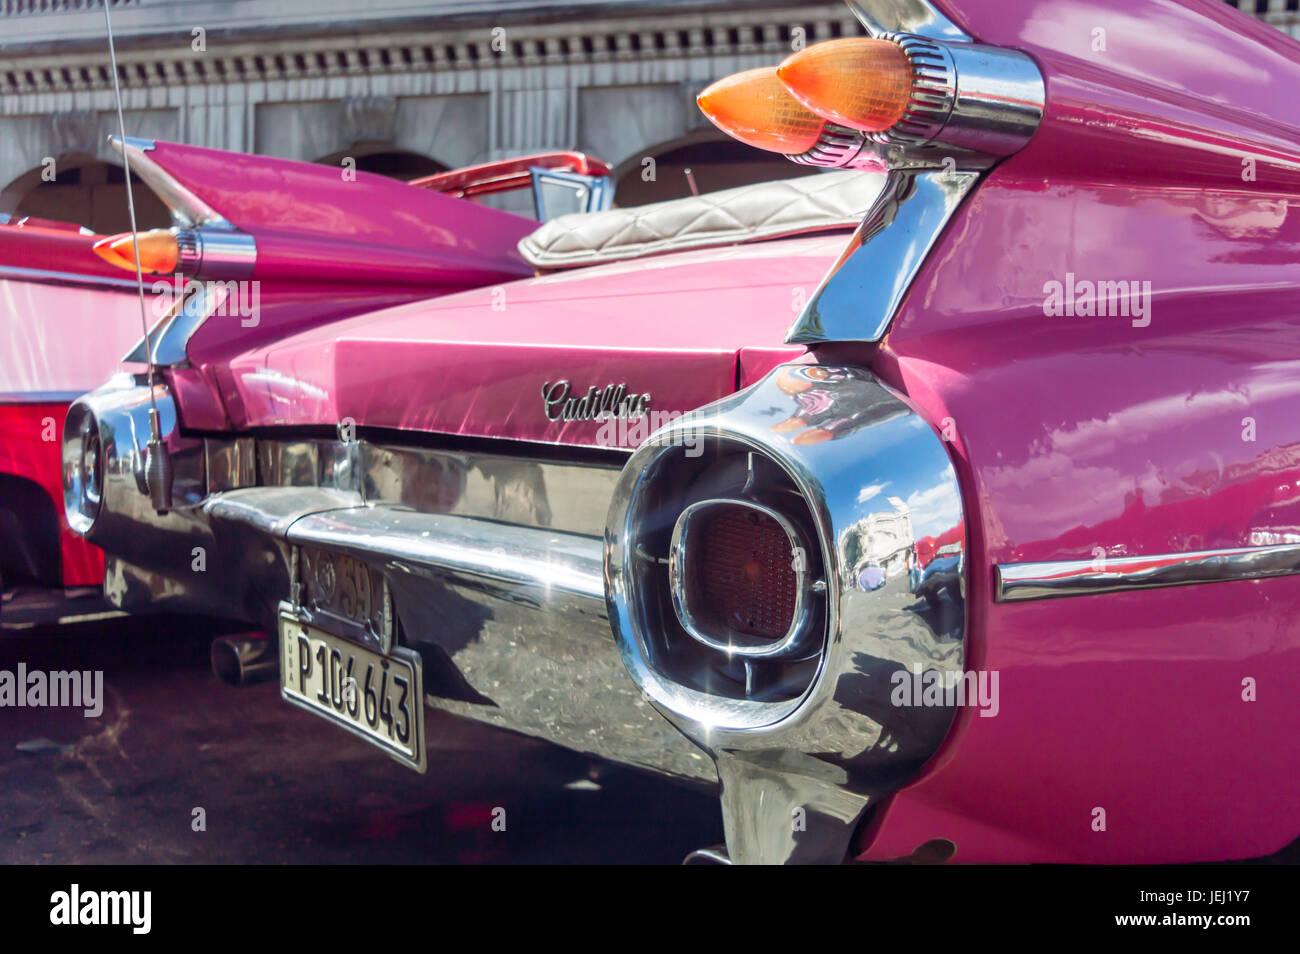 HAVANNA; Kuba - APRIL 18: Detail eines rosa klassische amerikanische Cadillac Autos; am 18. April; 2016 in Havanna Stockbild